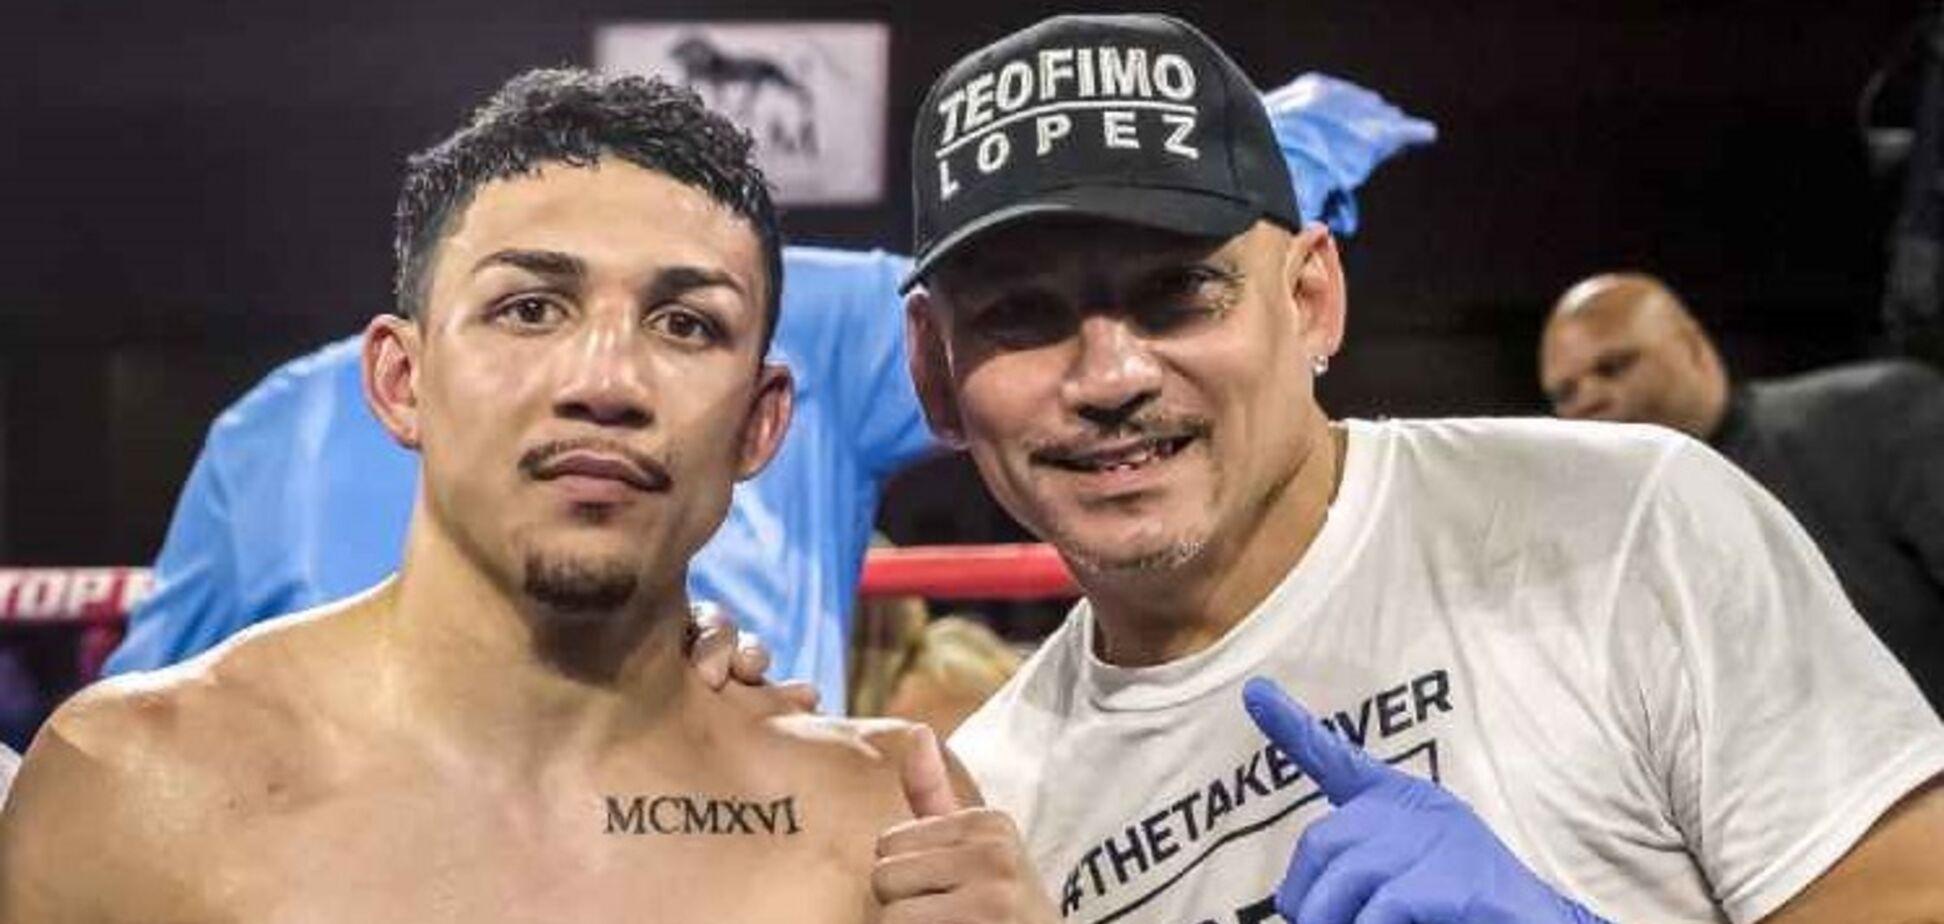 Теофимо Лопес и его отец